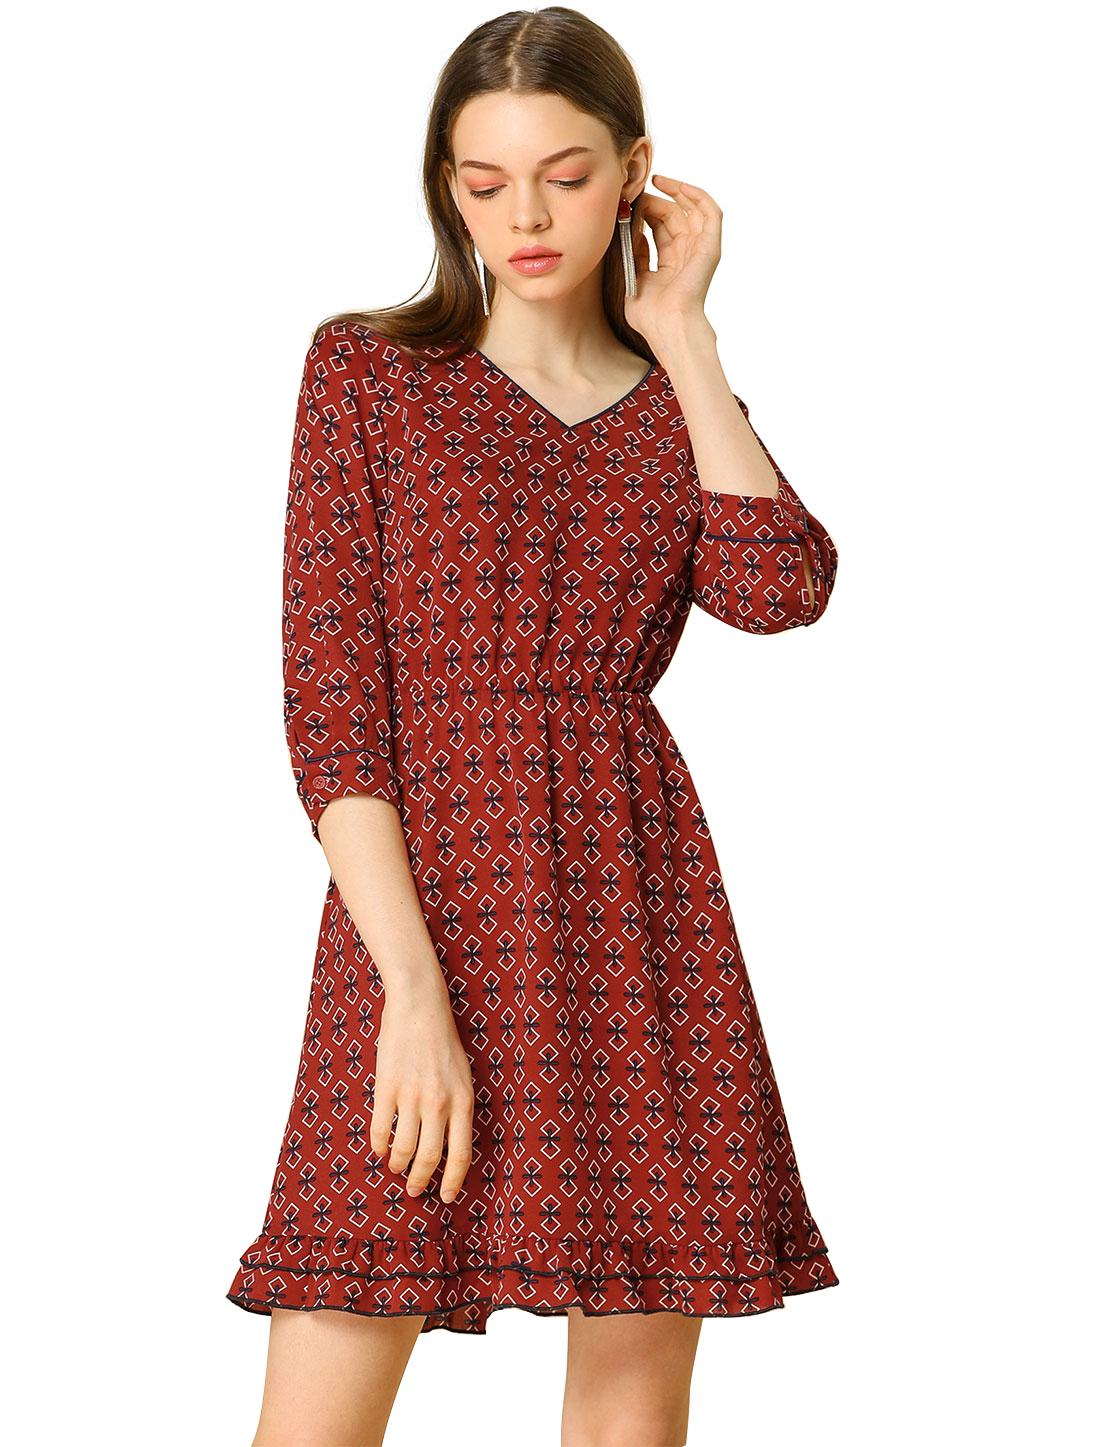 Women's 3/4 Sleeve V Neck Ruffle Hem Geometric Motifs Flare Chiffon Dress Red L